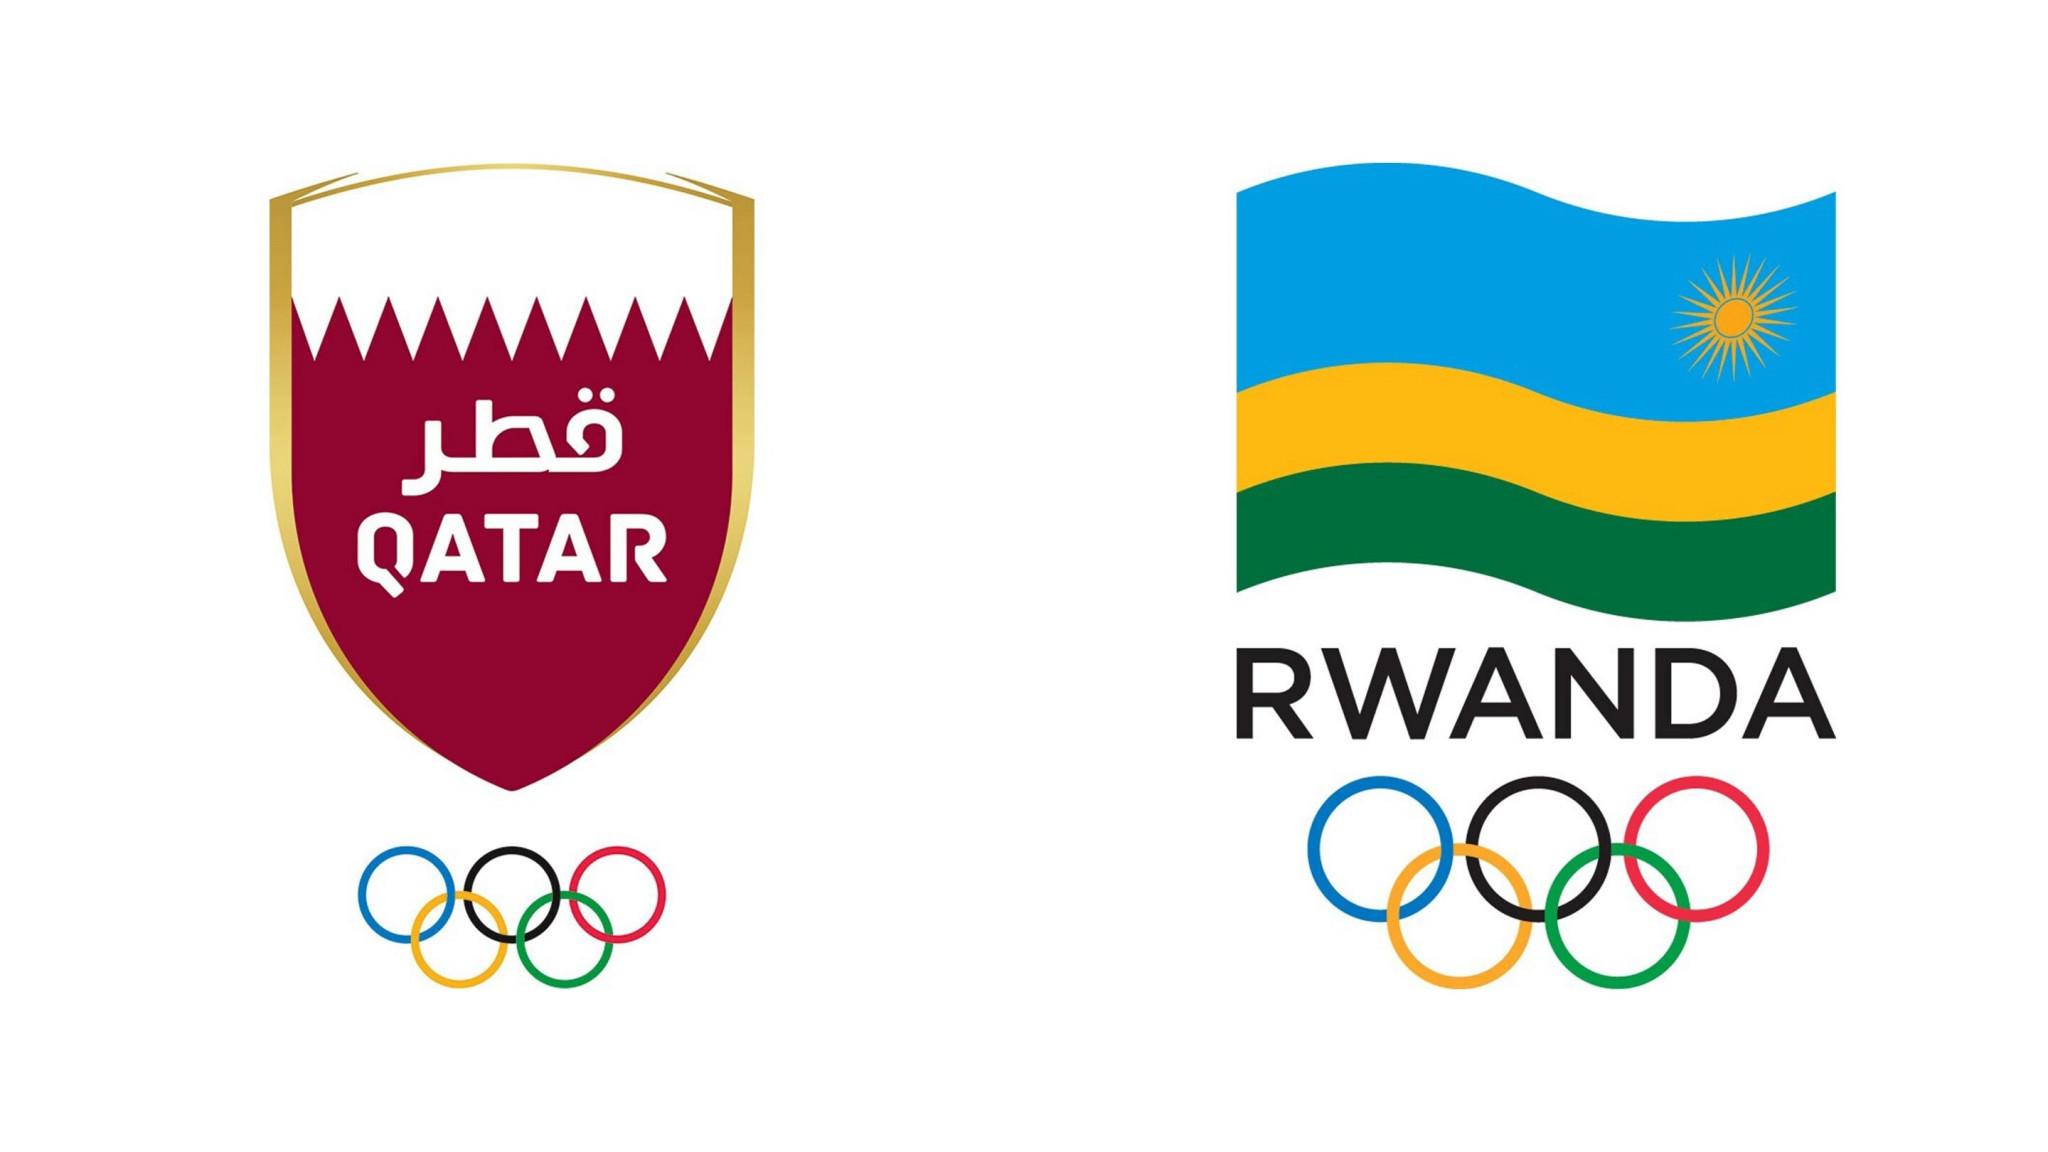 IOC vaccine hubs set up in Qatar and Rwanda in inoculation push for Tokyo 2020